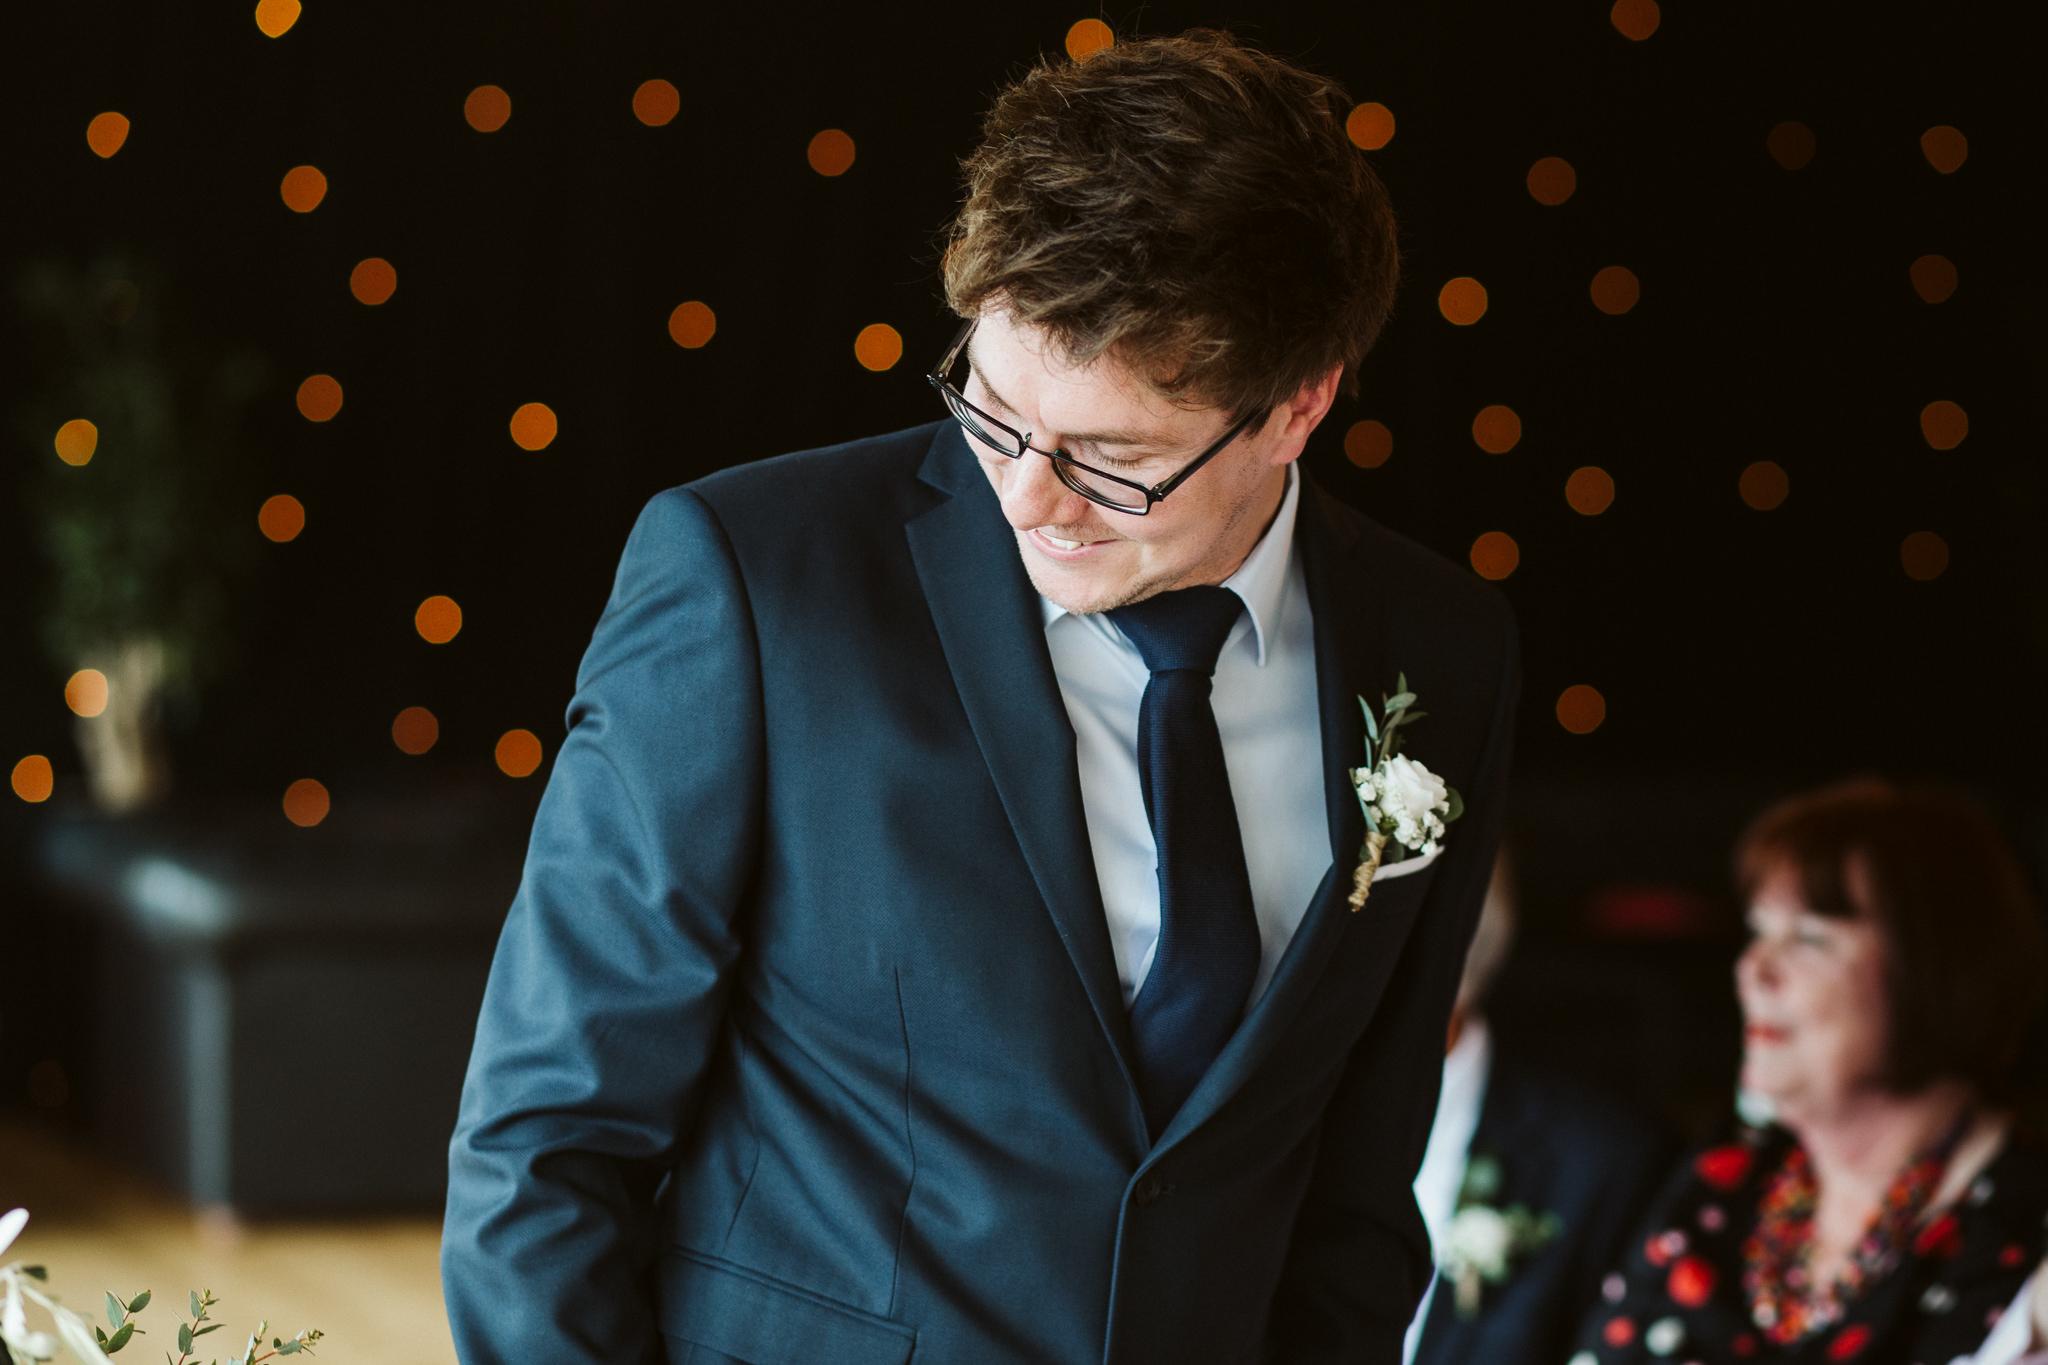 baltic-wedding-margarita-hope (17).jpg